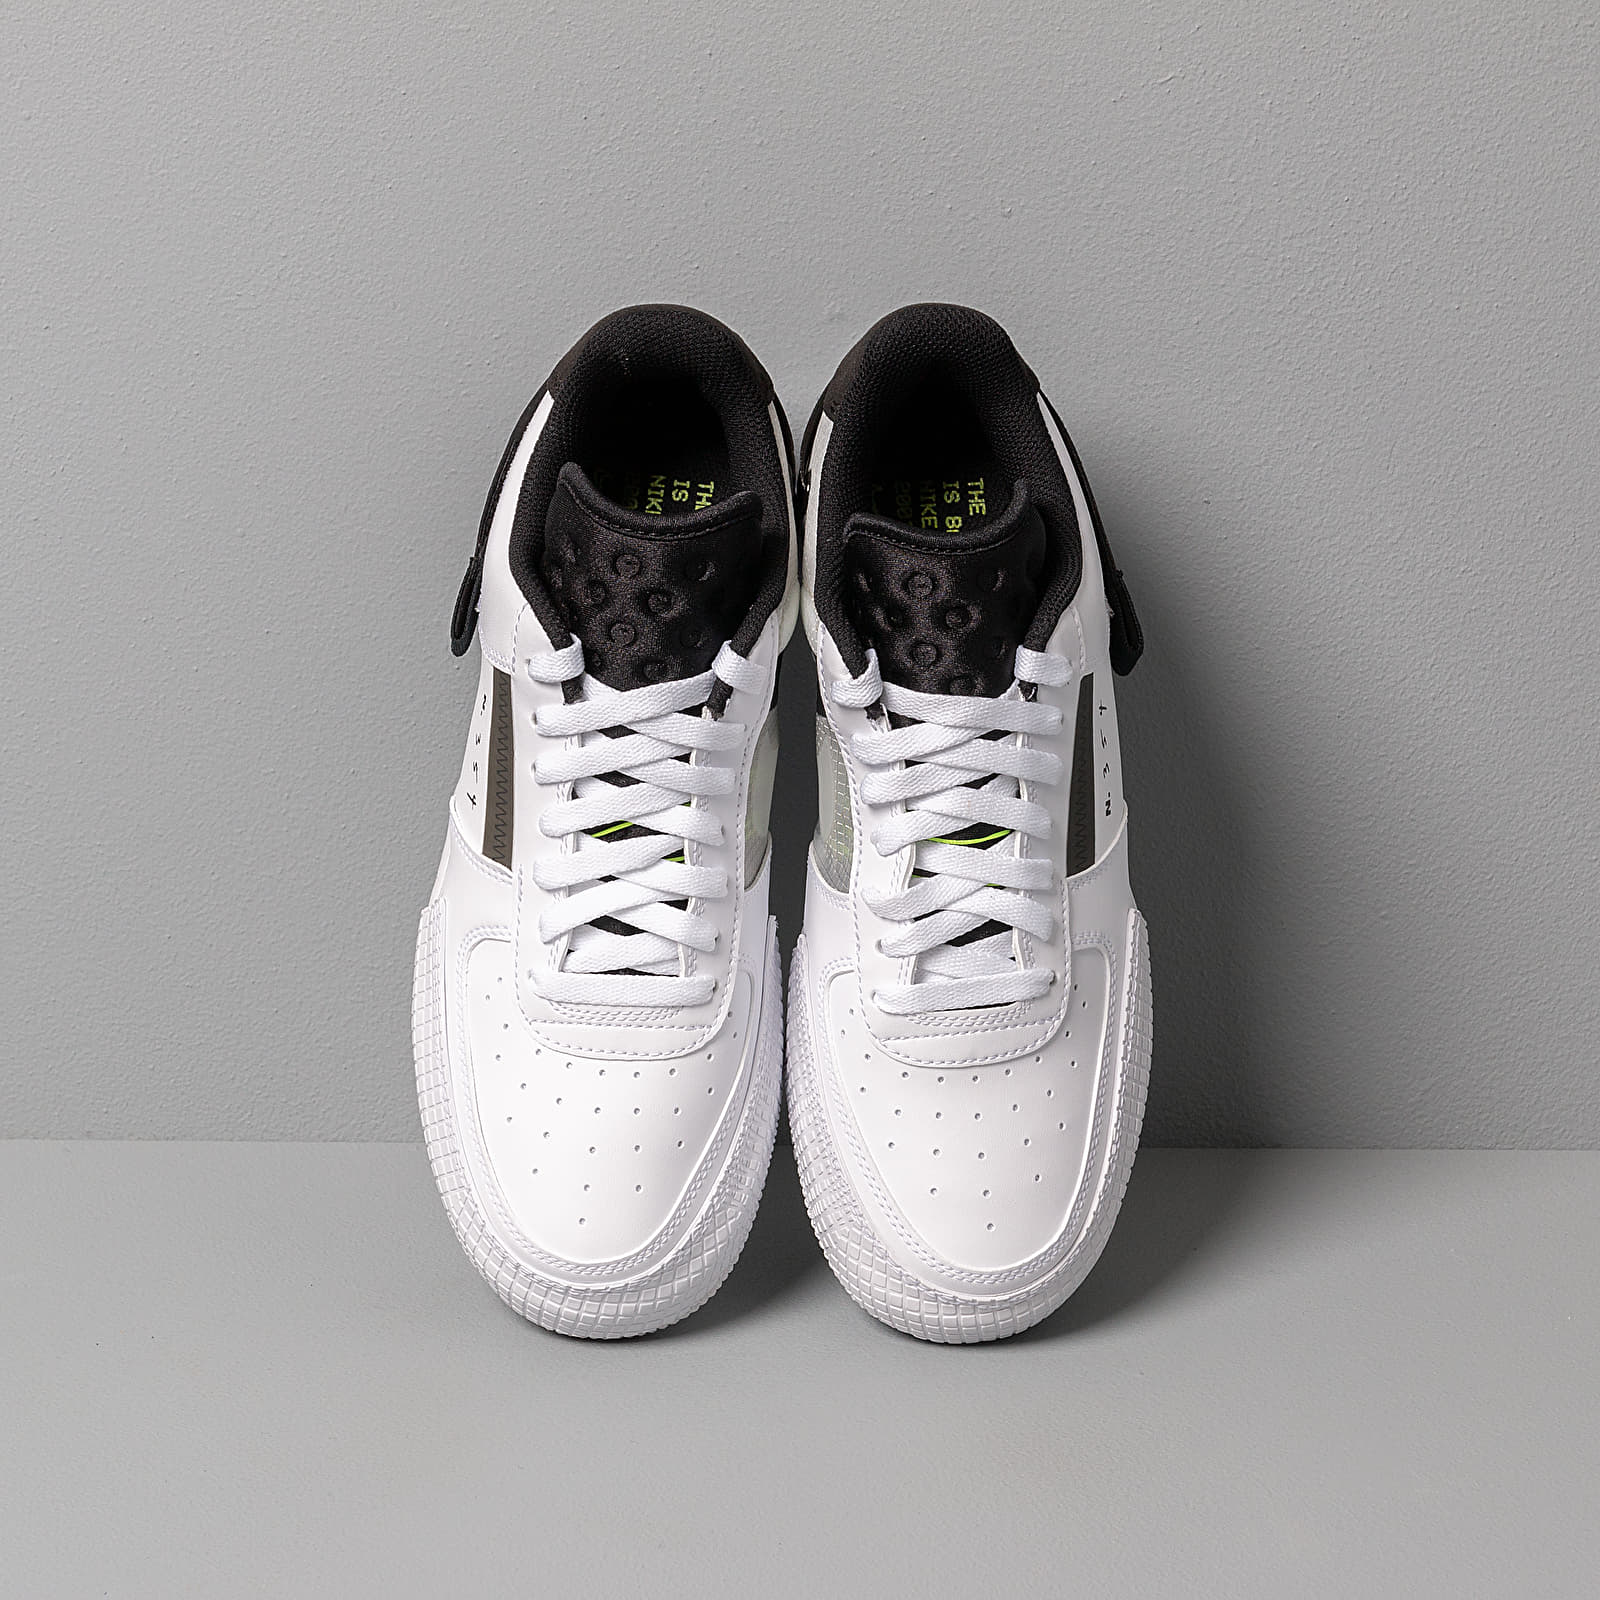 Nike Air Force 1 Type White Volt Black White AT7859 101